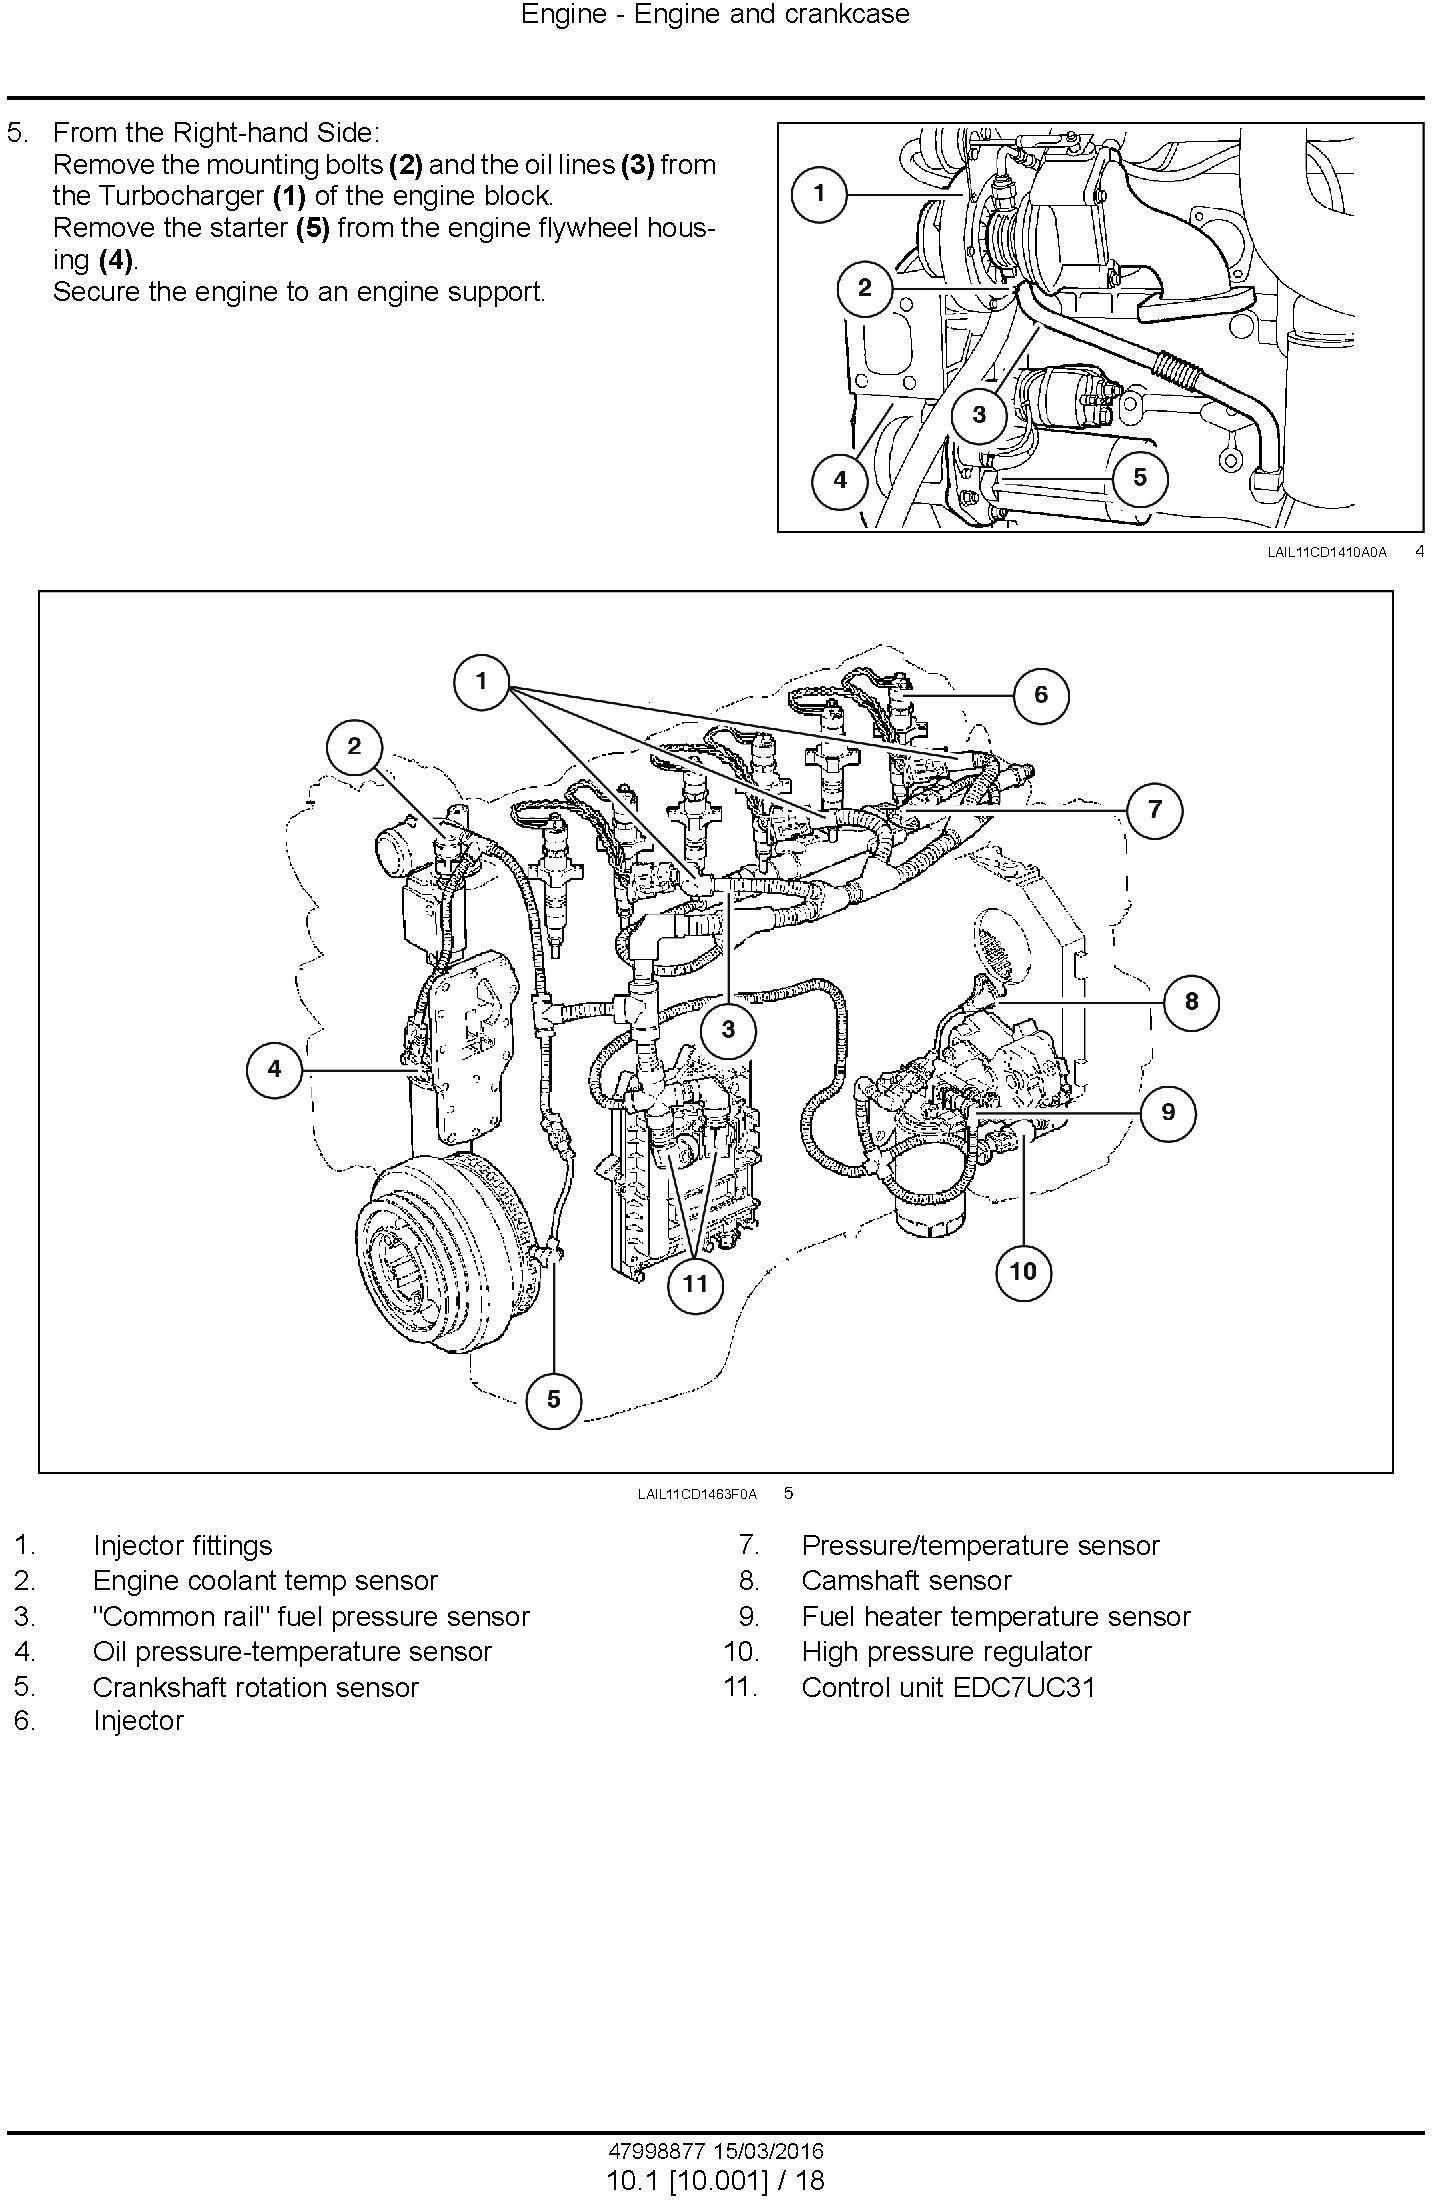 New Holland , Case 1650L Crawler dozer Service Manual - 2